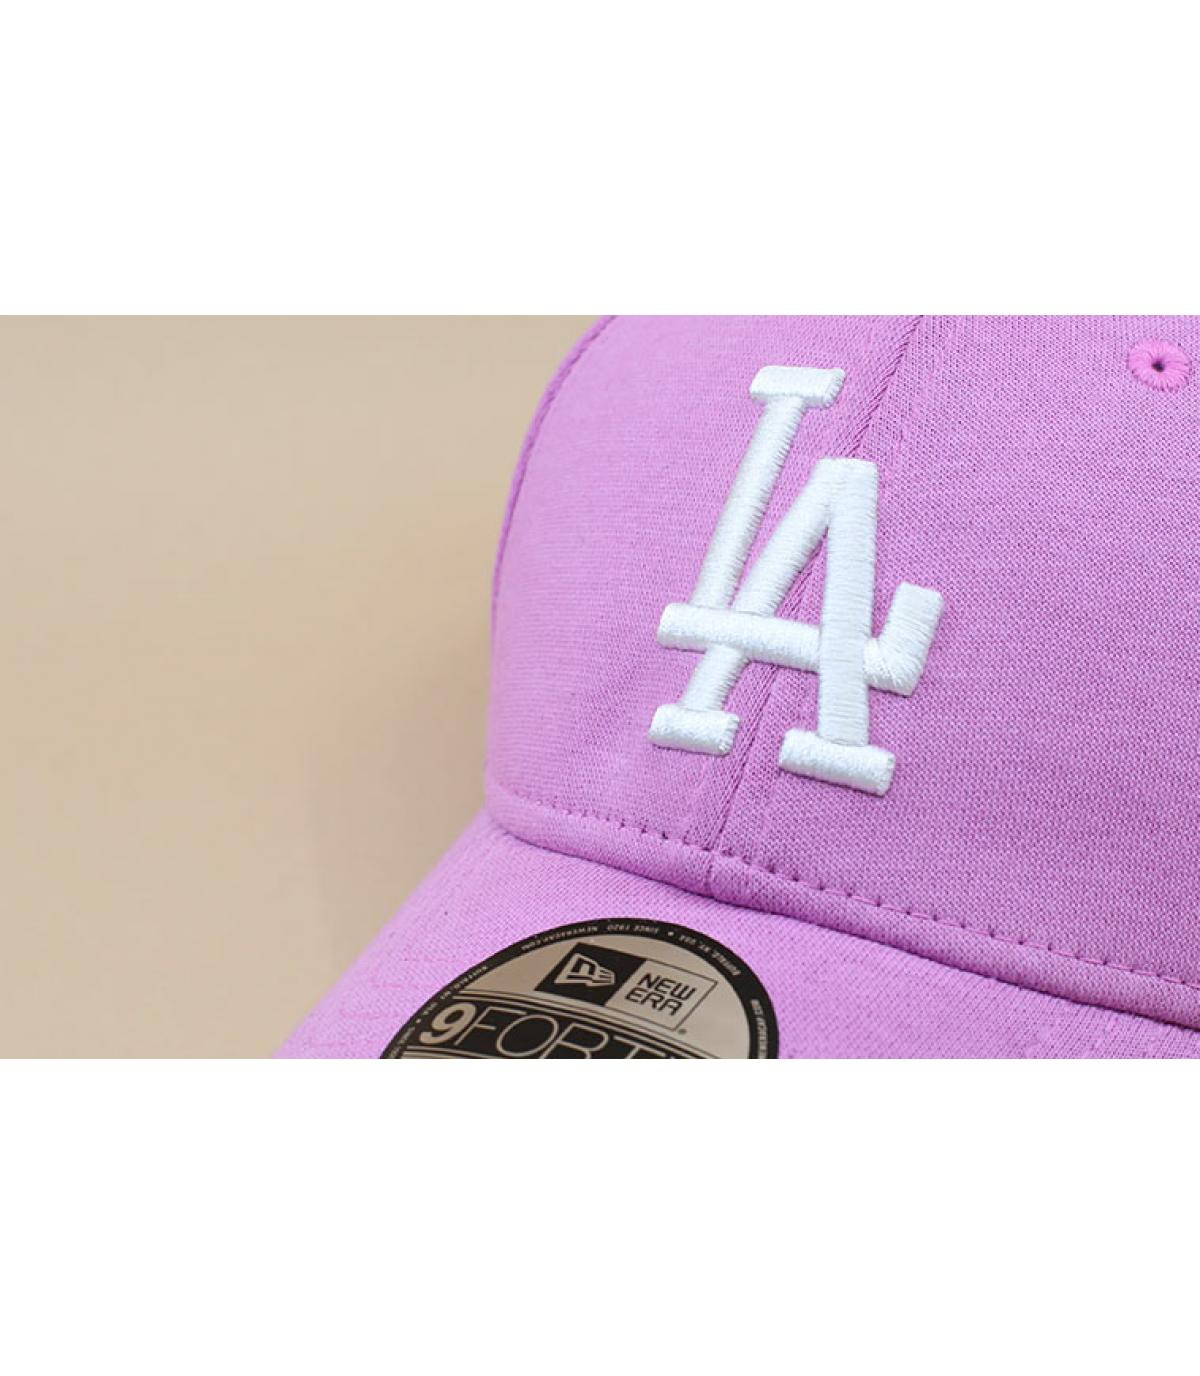 Details Jersey Pack 940 LA pink - Abbildung 3